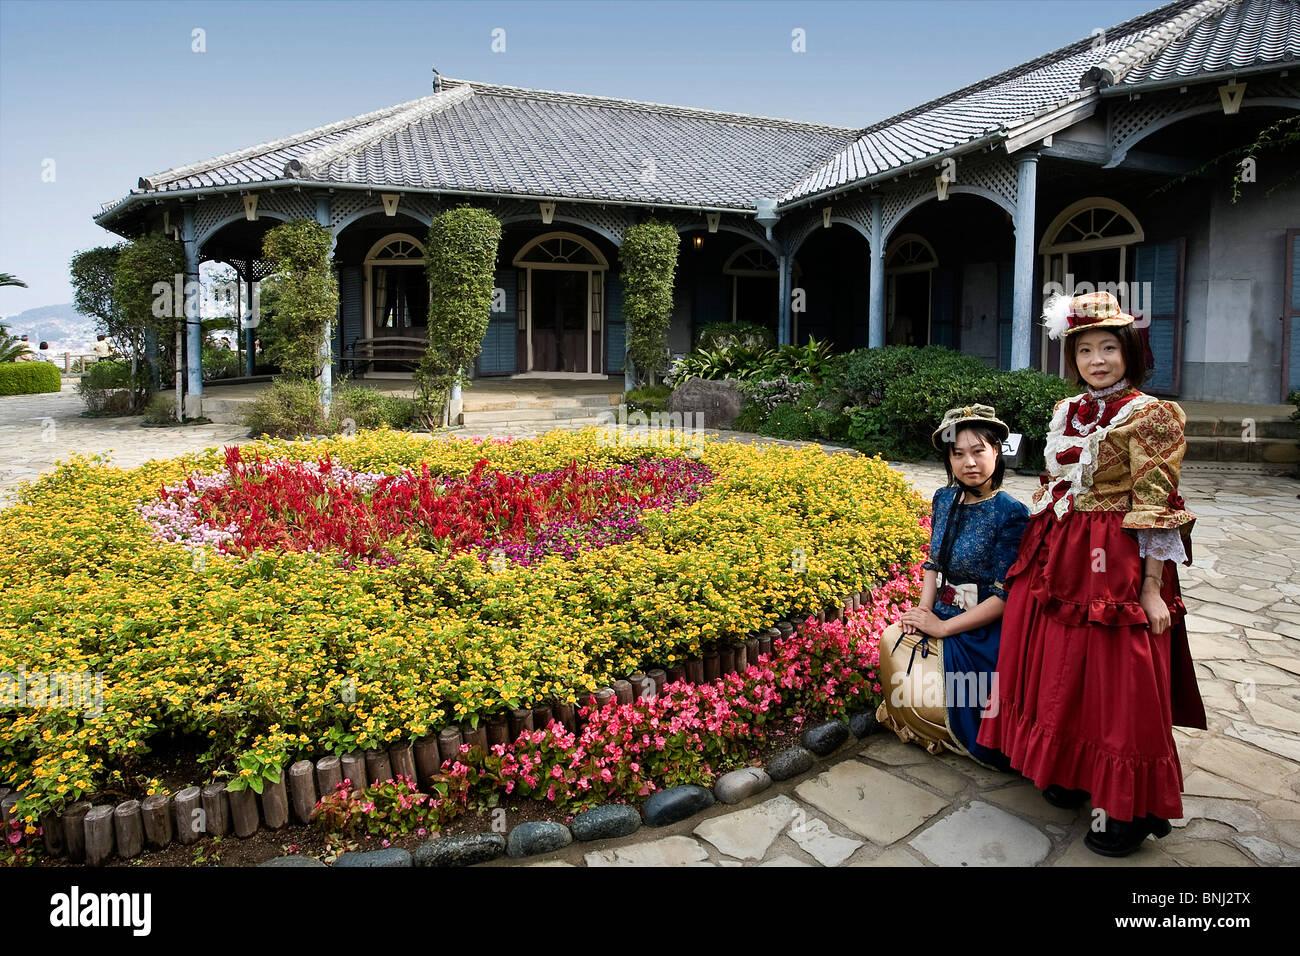 Japan Asia Kyushu Iceland Nagasaki City Glover Garden Glover House Stock Photo Royalty Free